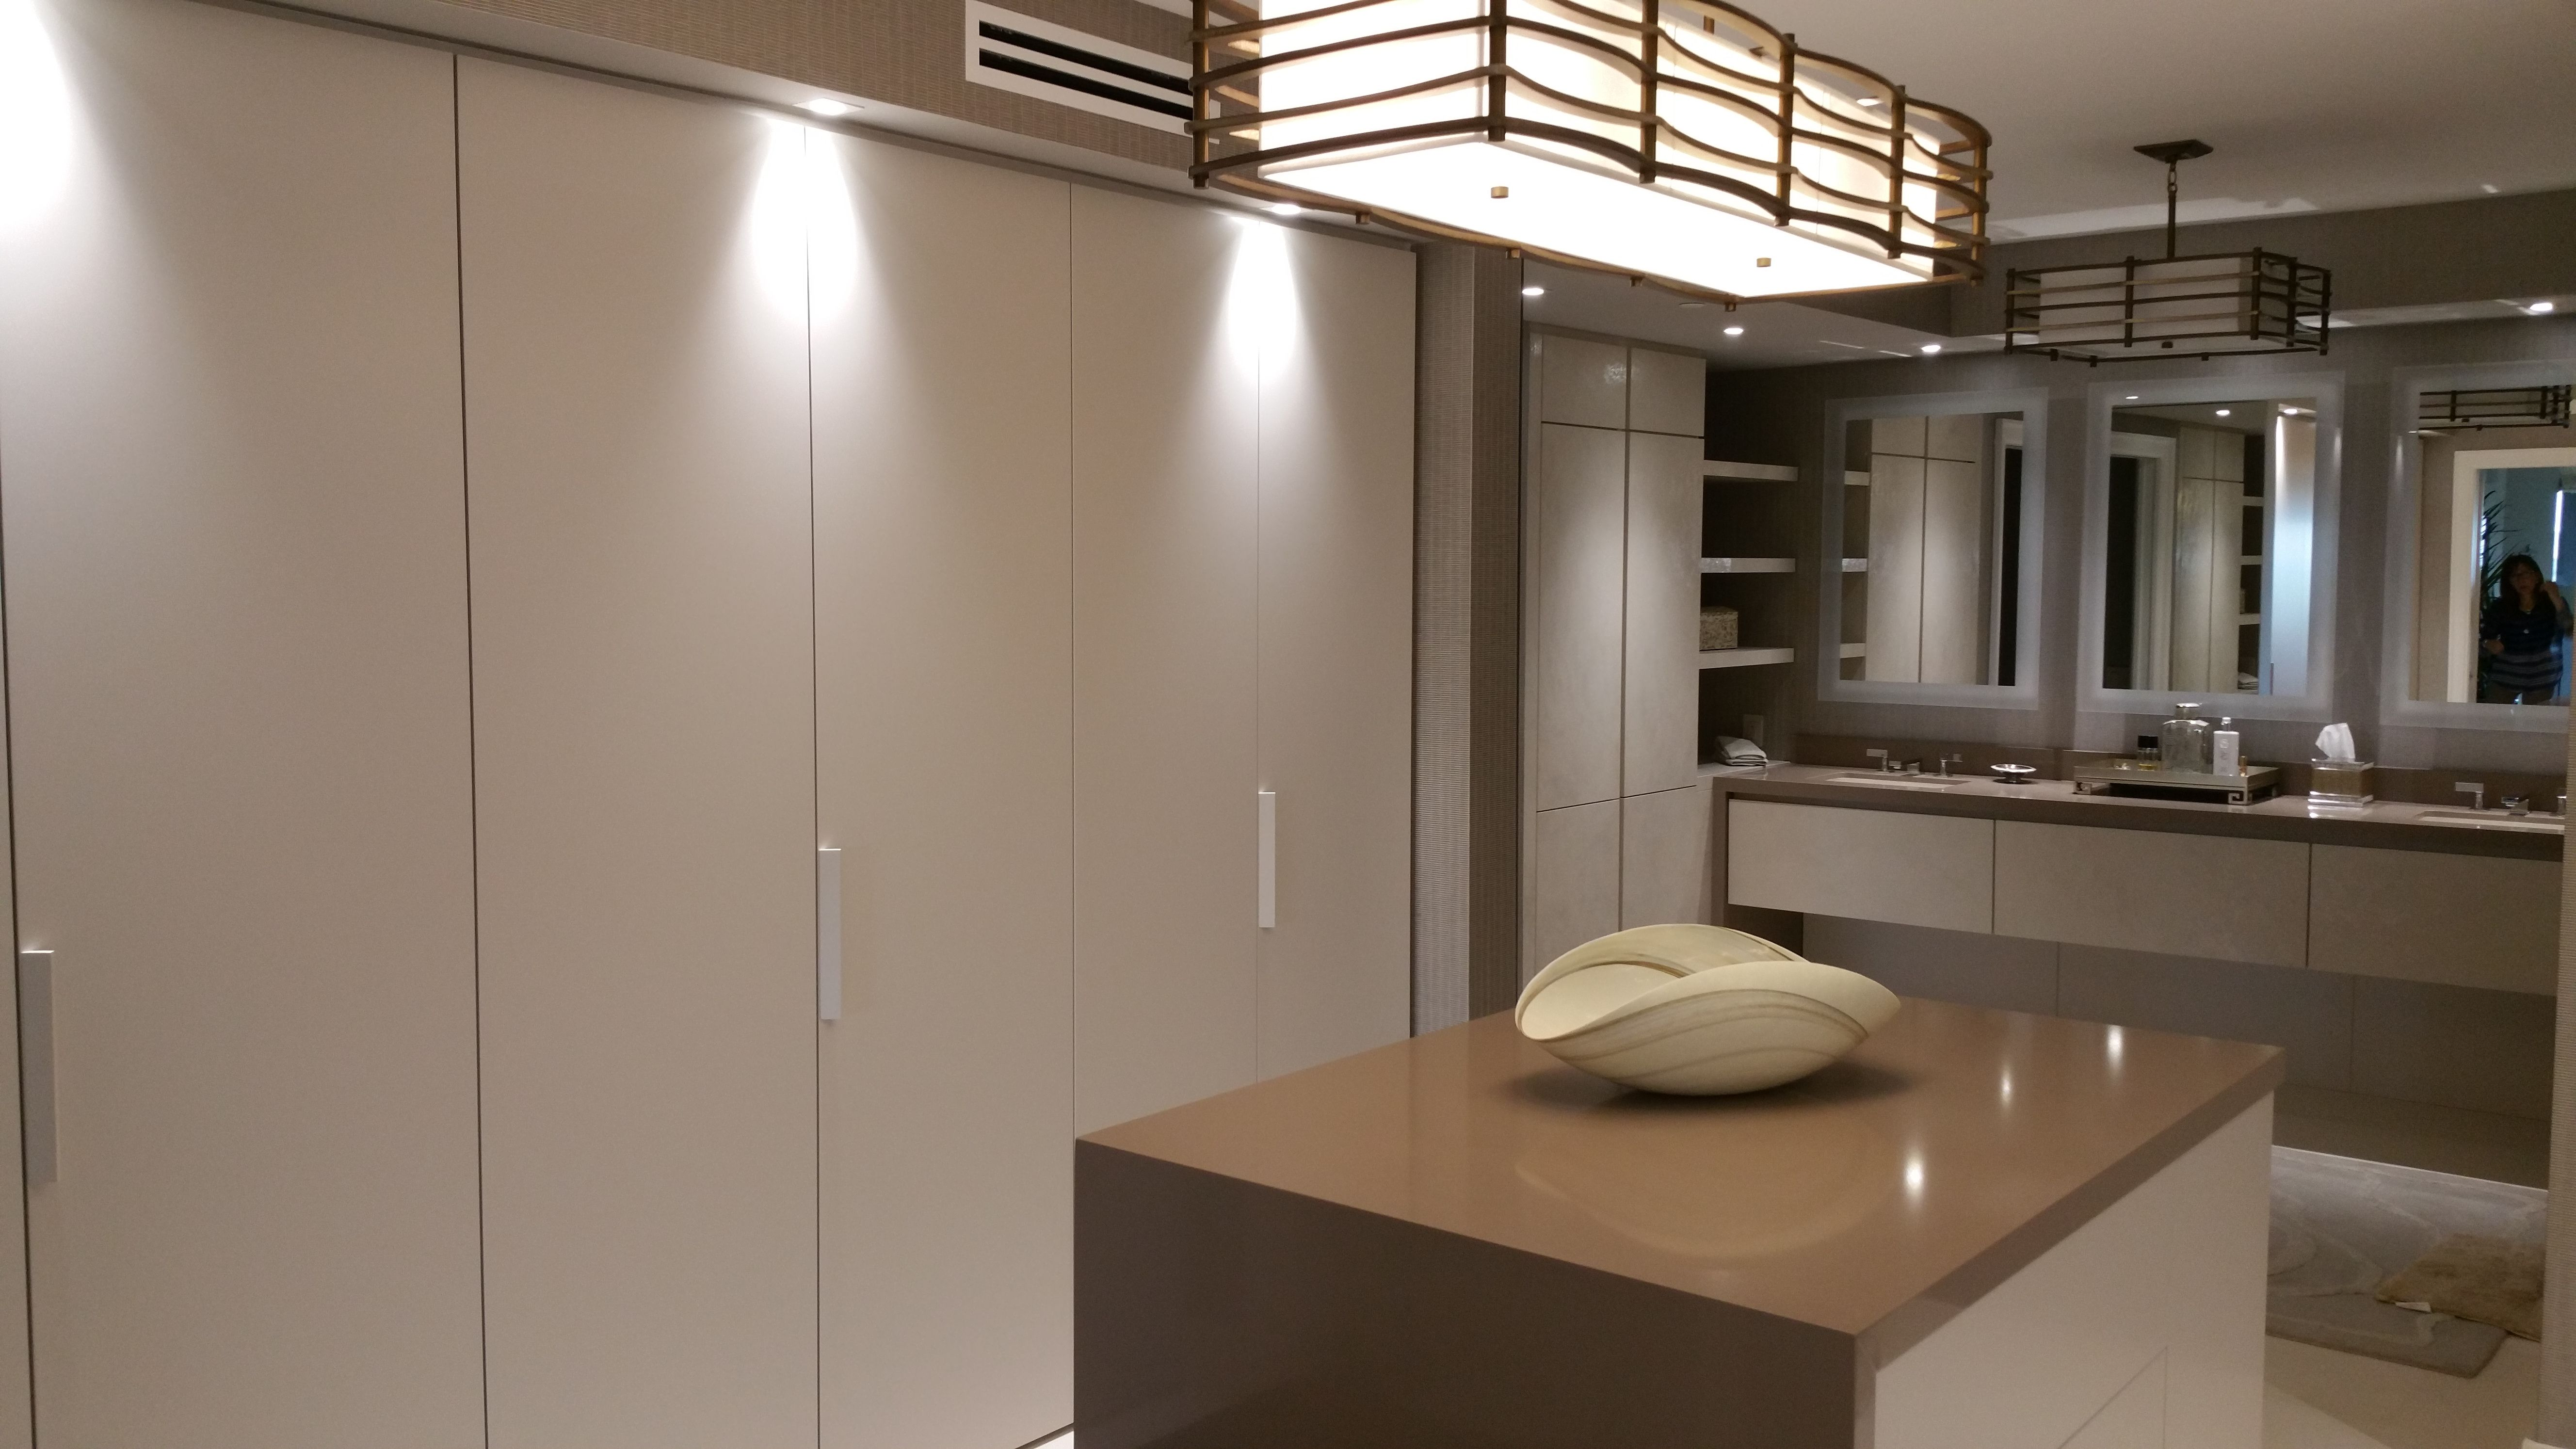 Royal Kitchens.co Naples FL | Kitchen design showrooms ...